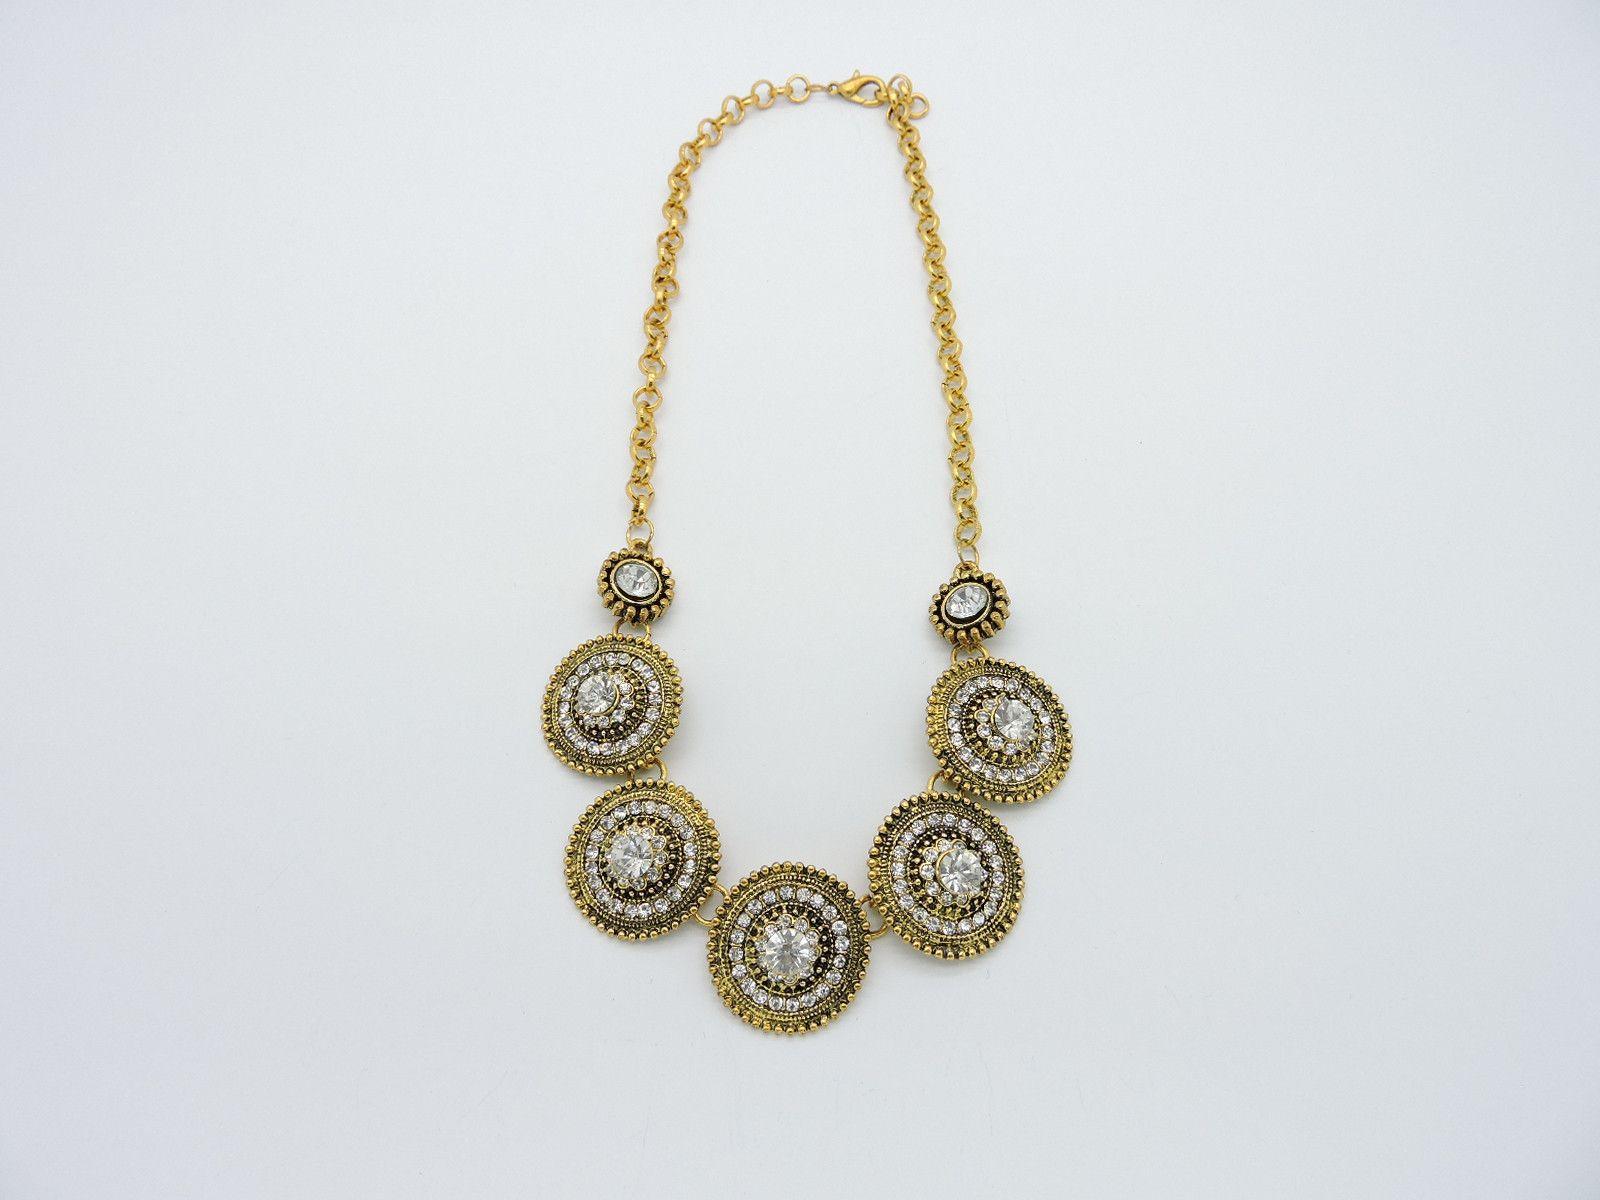 Stone Gold Necklace from Helen's Jewels. #jewelry #necklace #jewelryonpinterest #etsy #etsyjewelry #helensjewels #fashion #style #accessories #statementnecklace #glamorous #gold #goldnecklace #goldchain #goldpendant